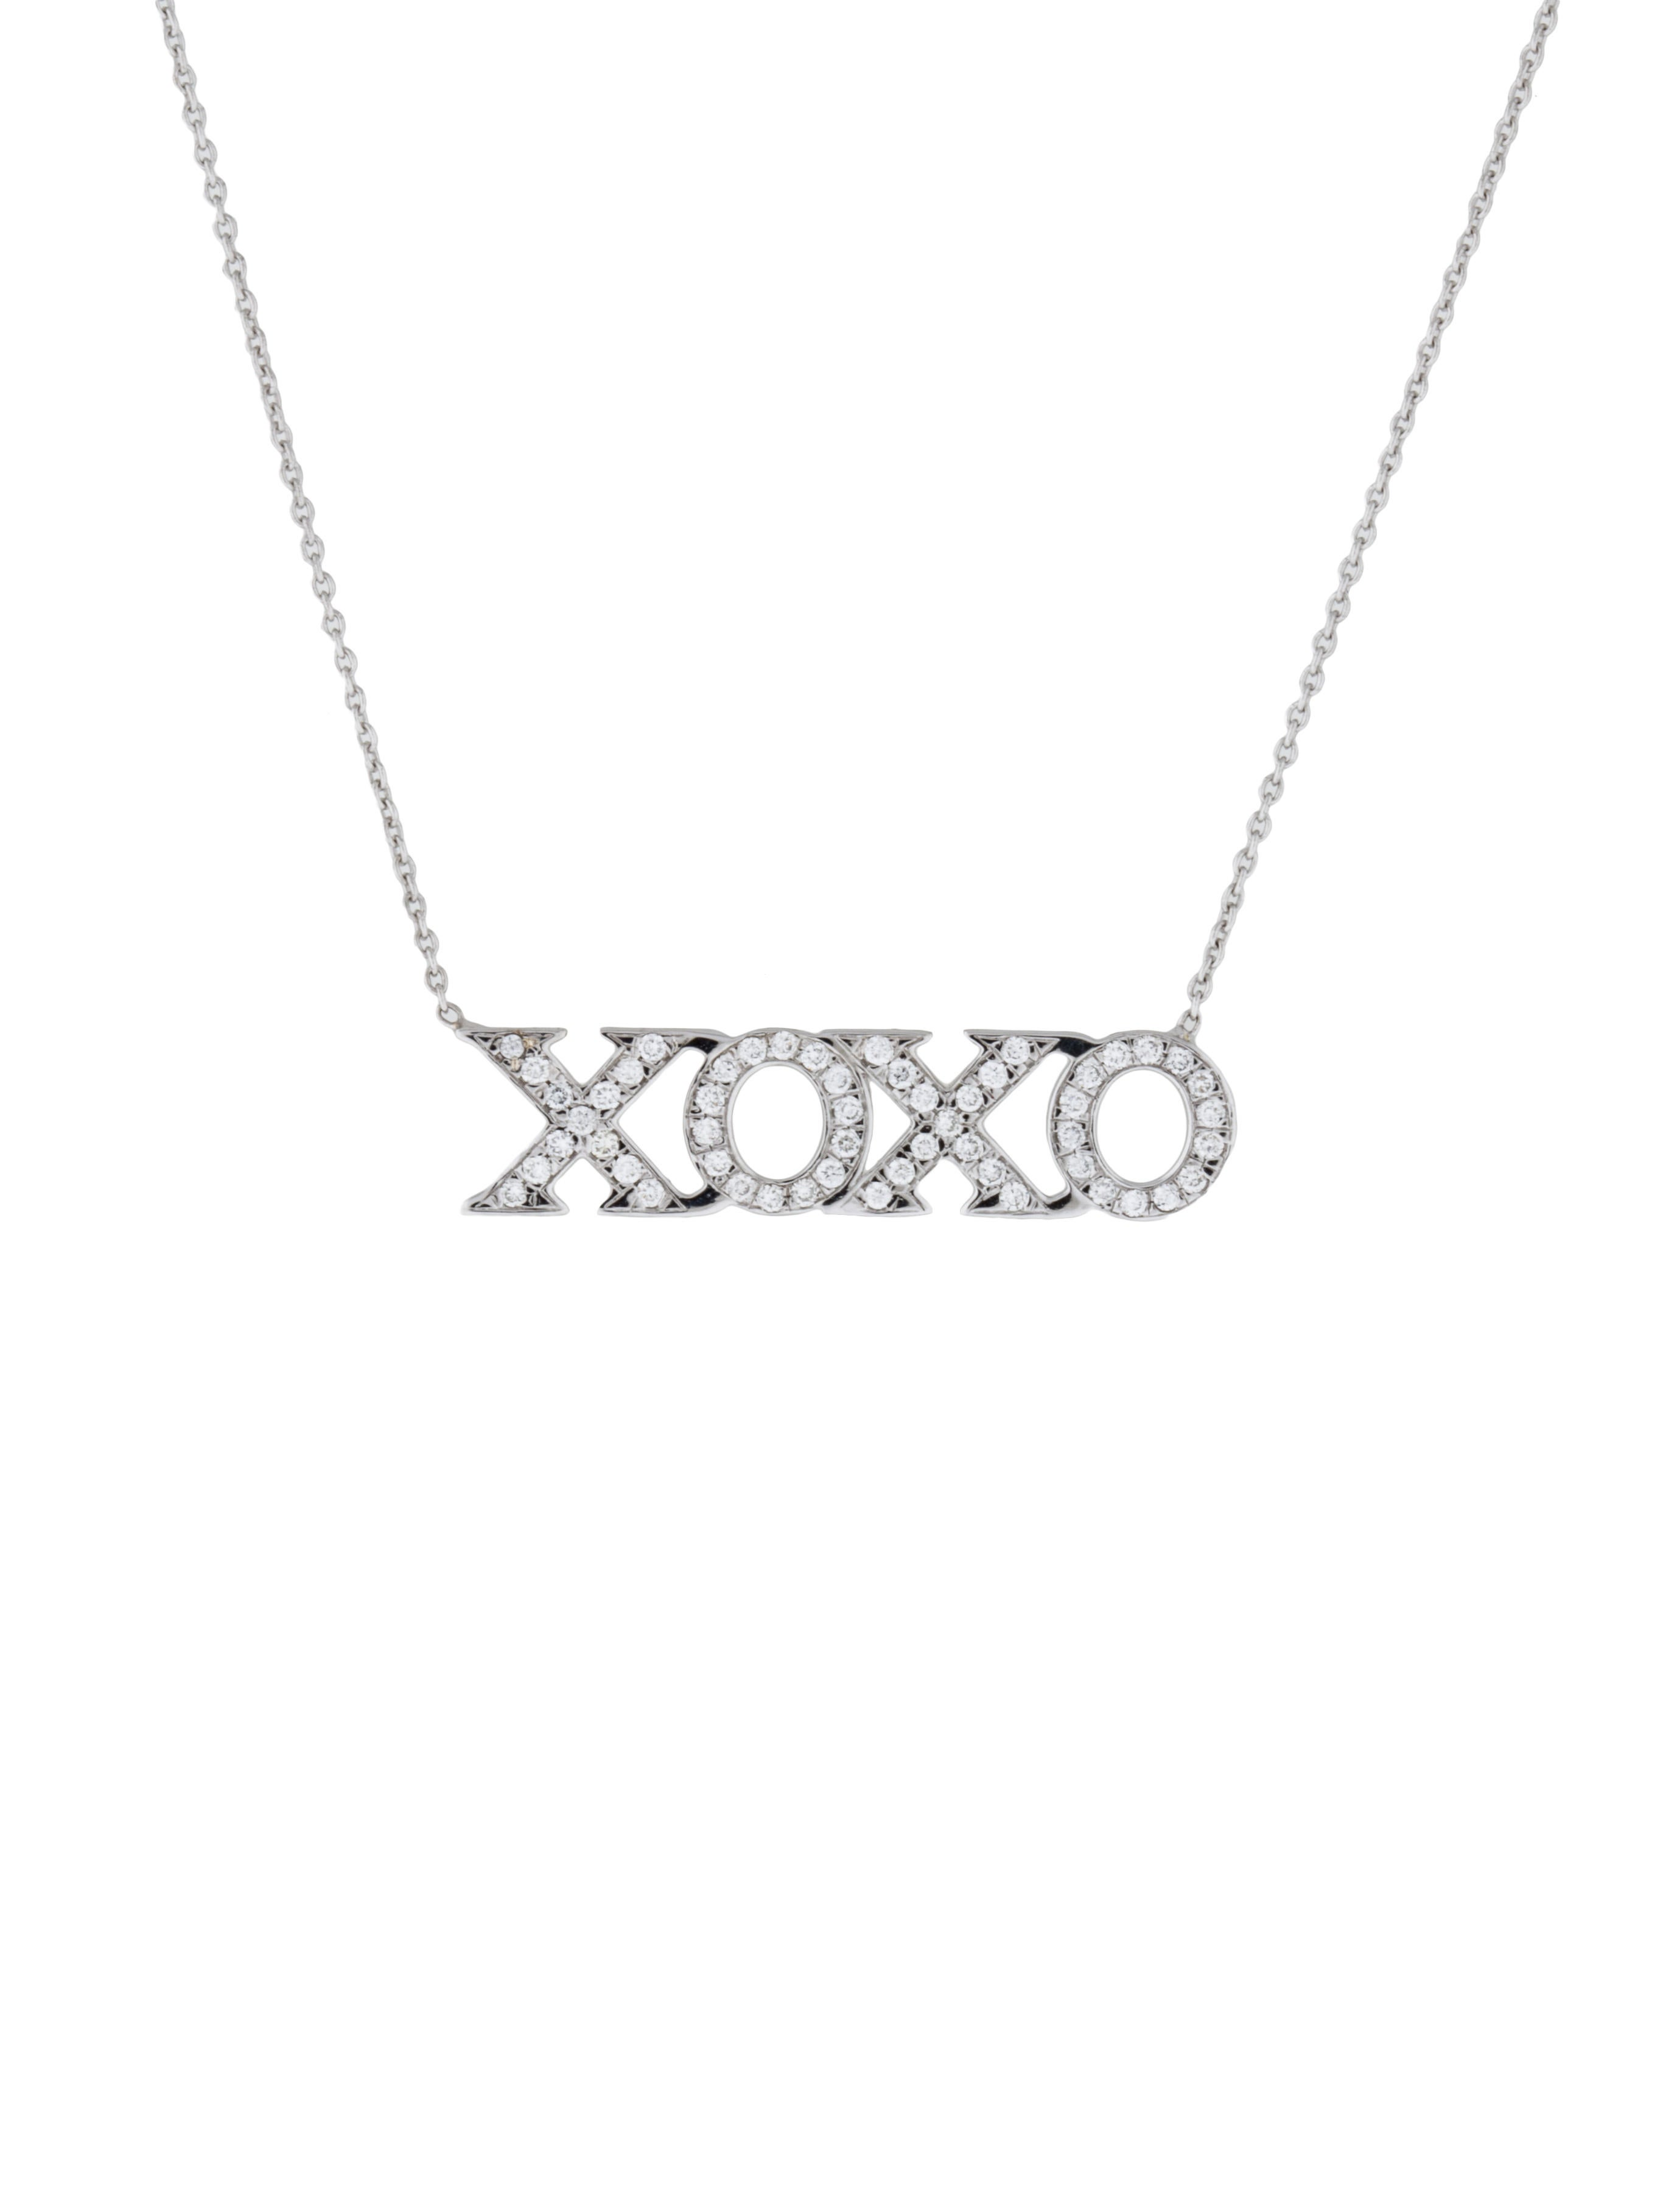 Roberto Coin 18k White Gold Diamond XOXO Necklace pBxsOJN